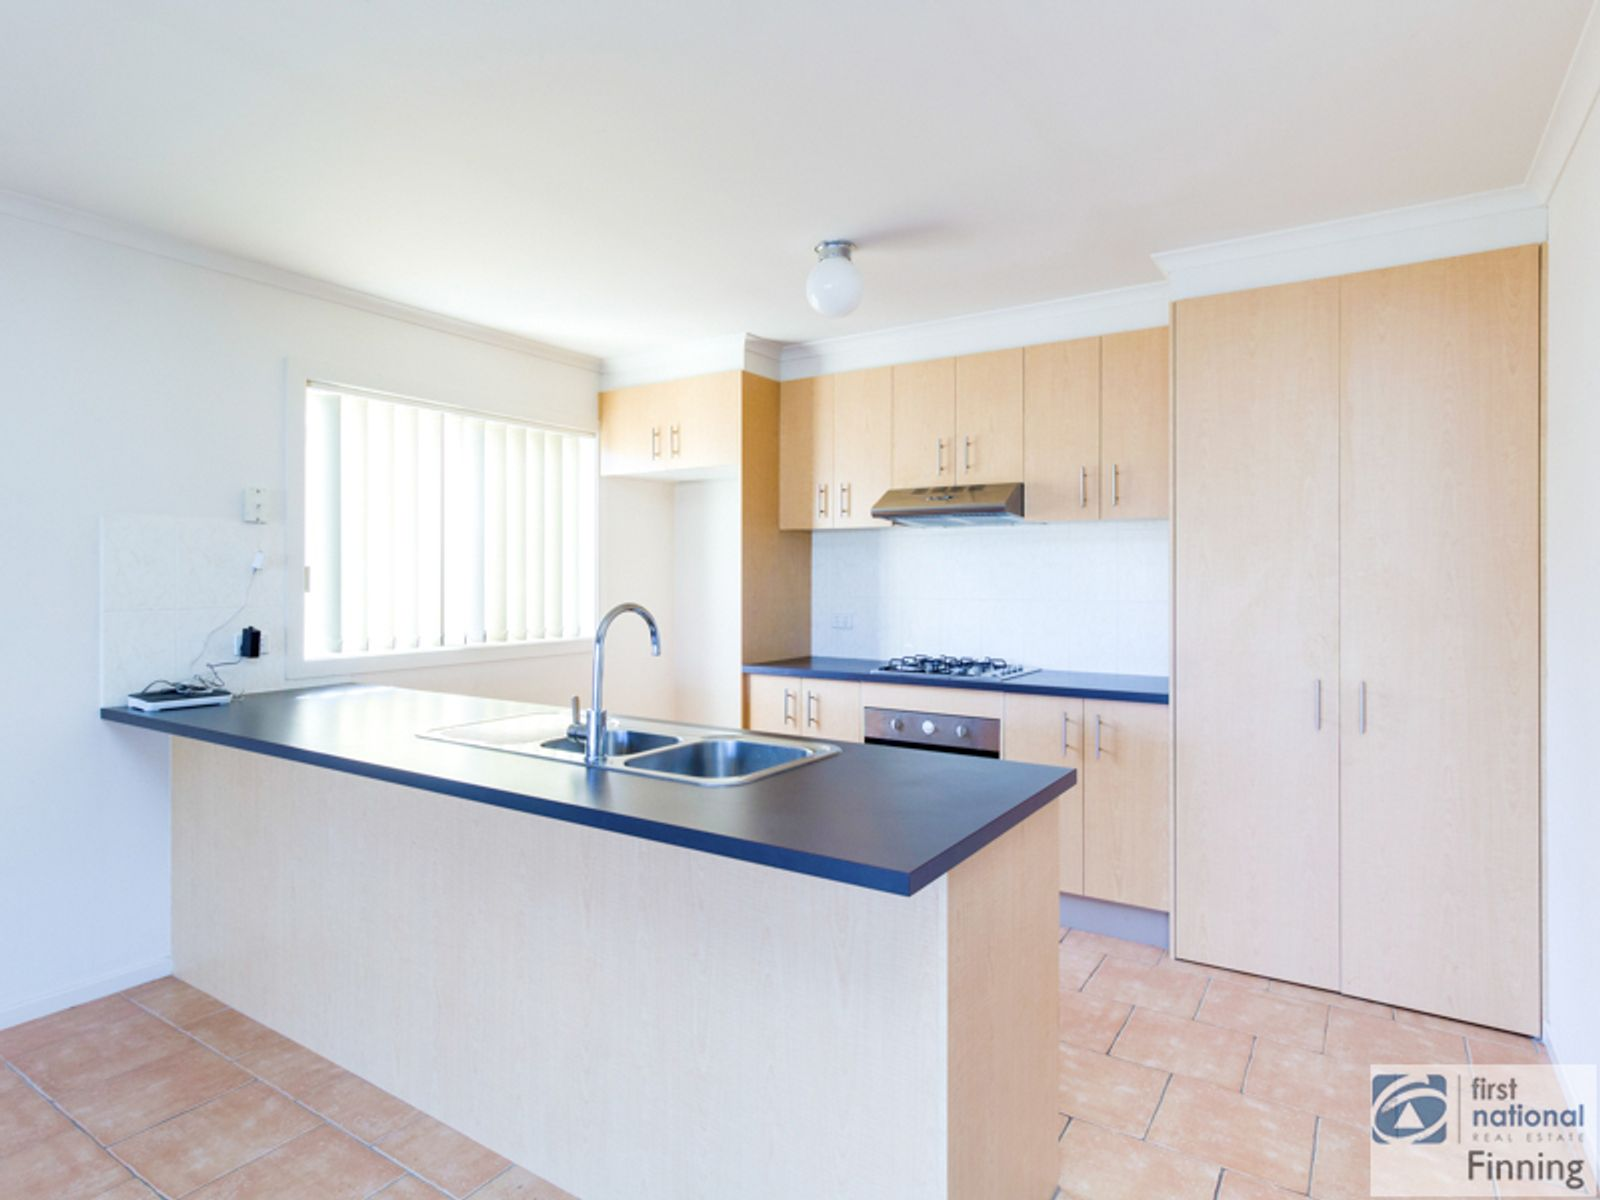 19 Janna Place, Berwick, VIC 3806